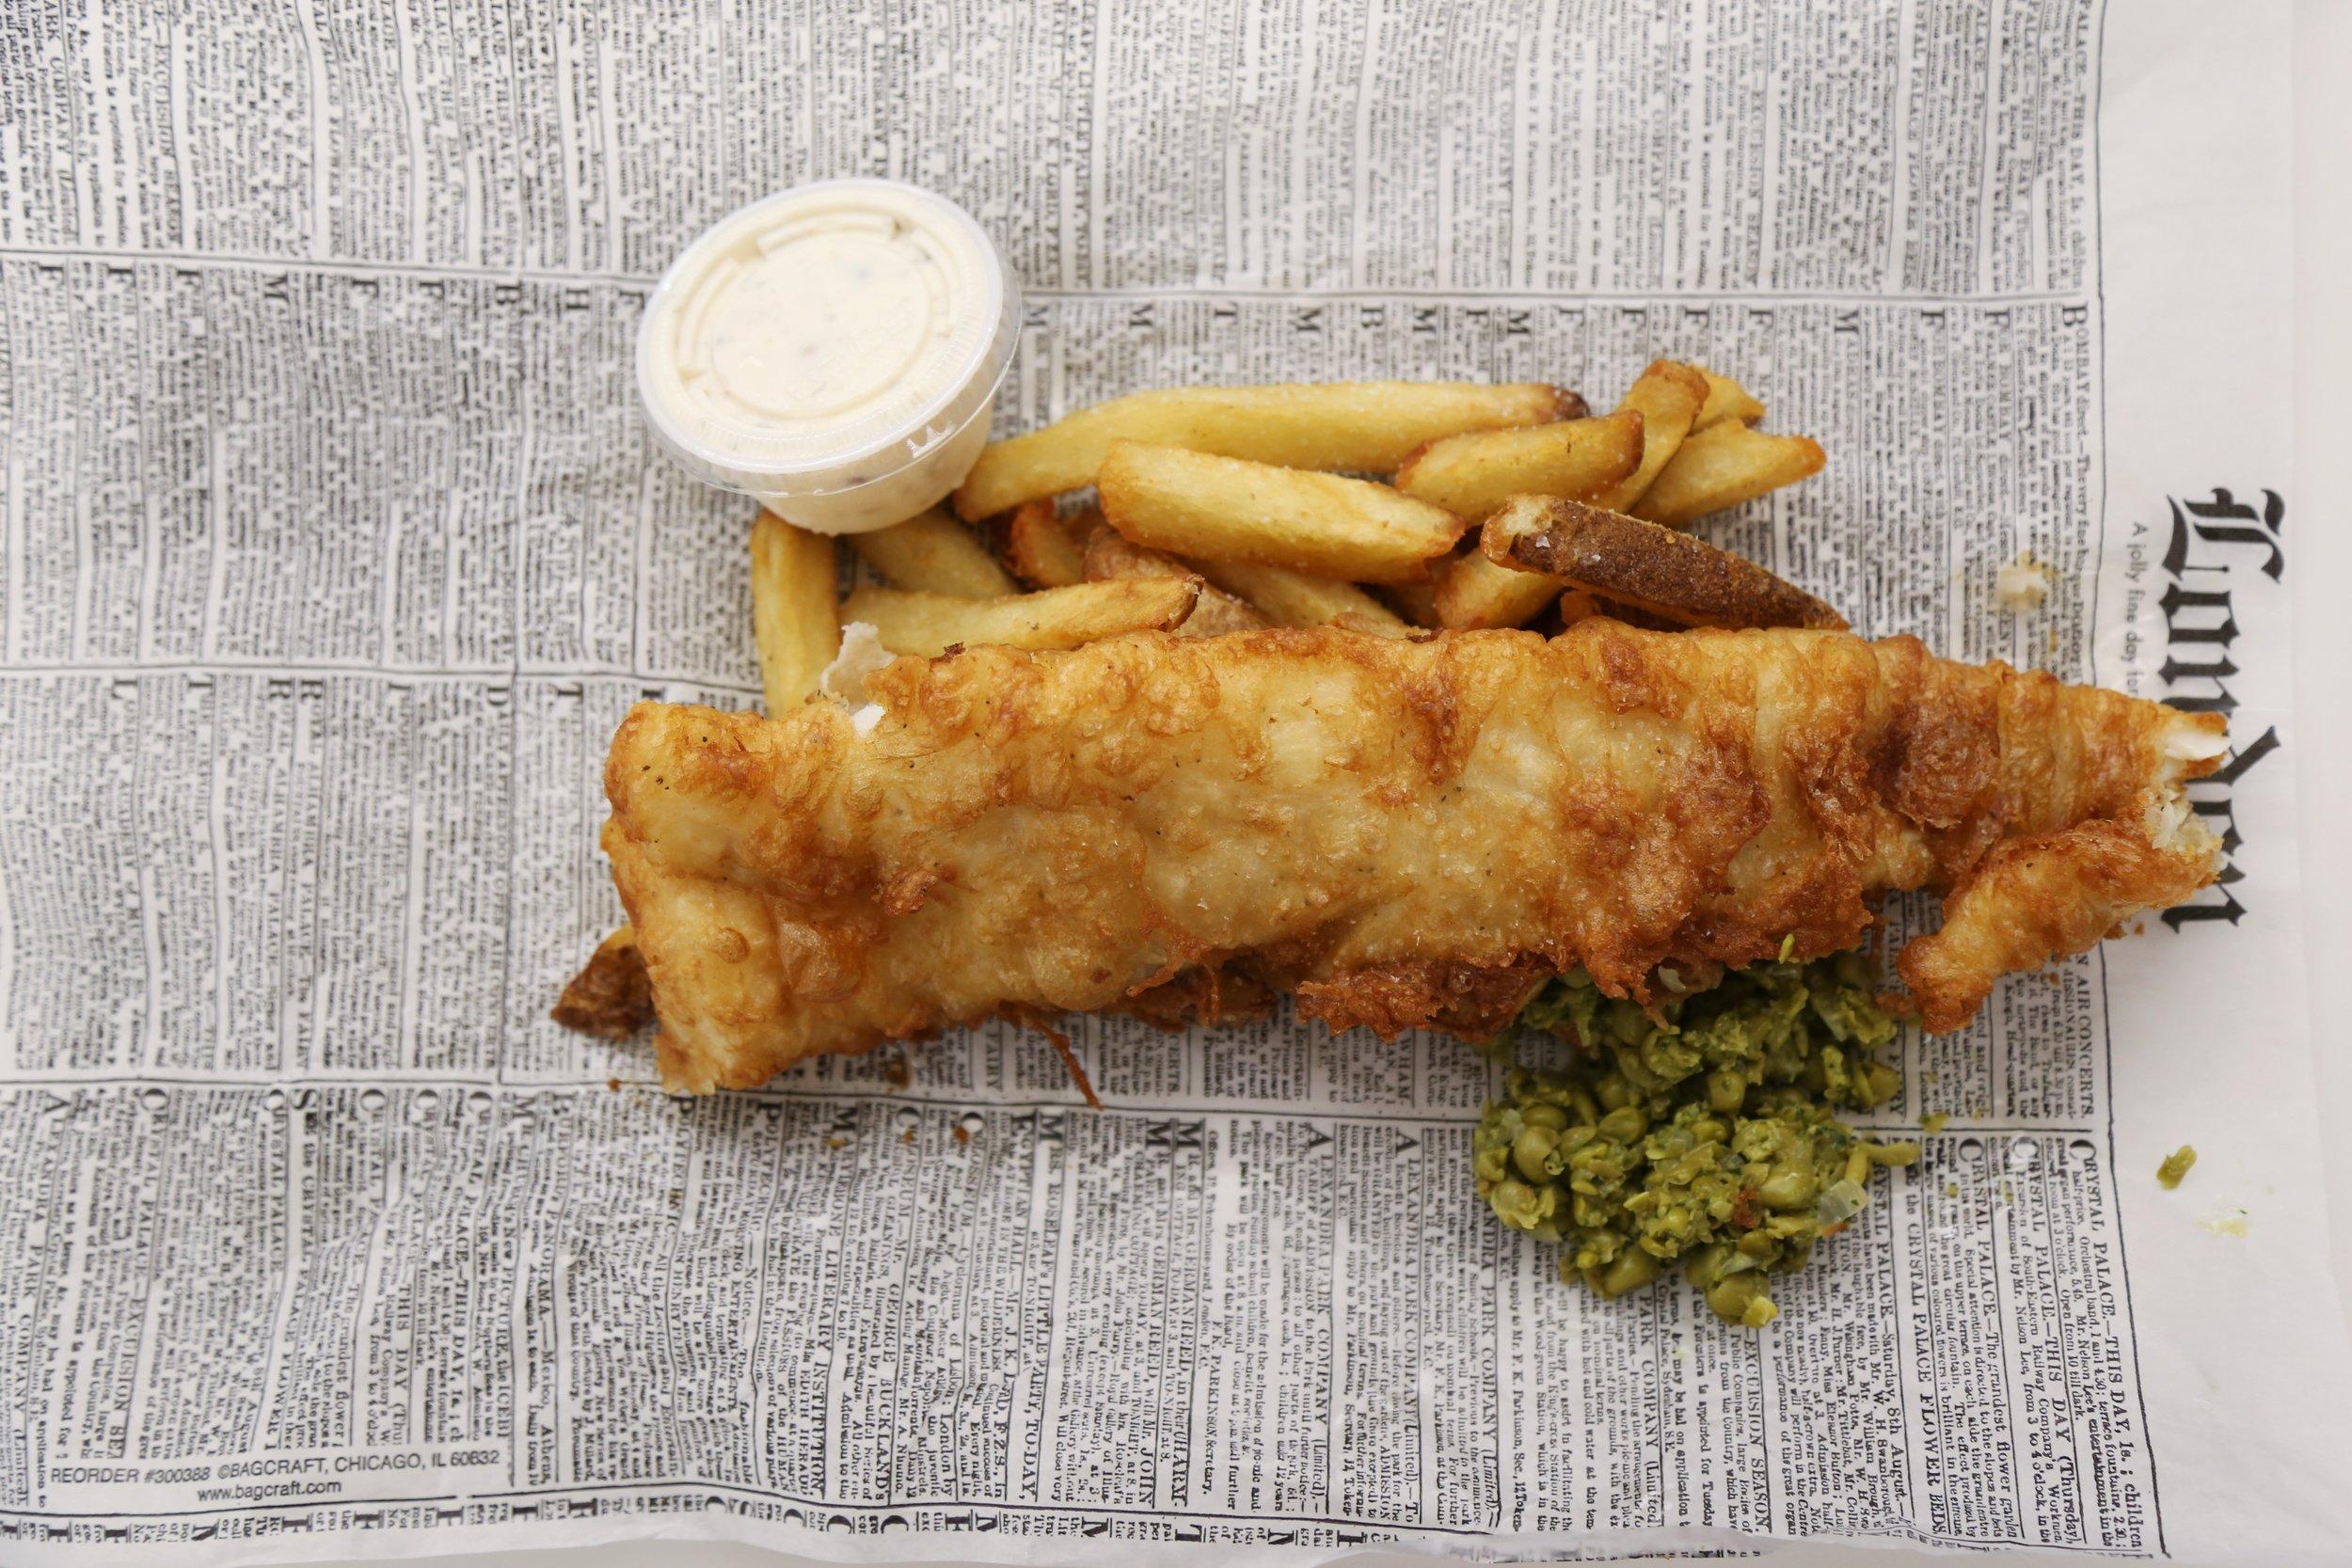 Nosh Fish and Chips